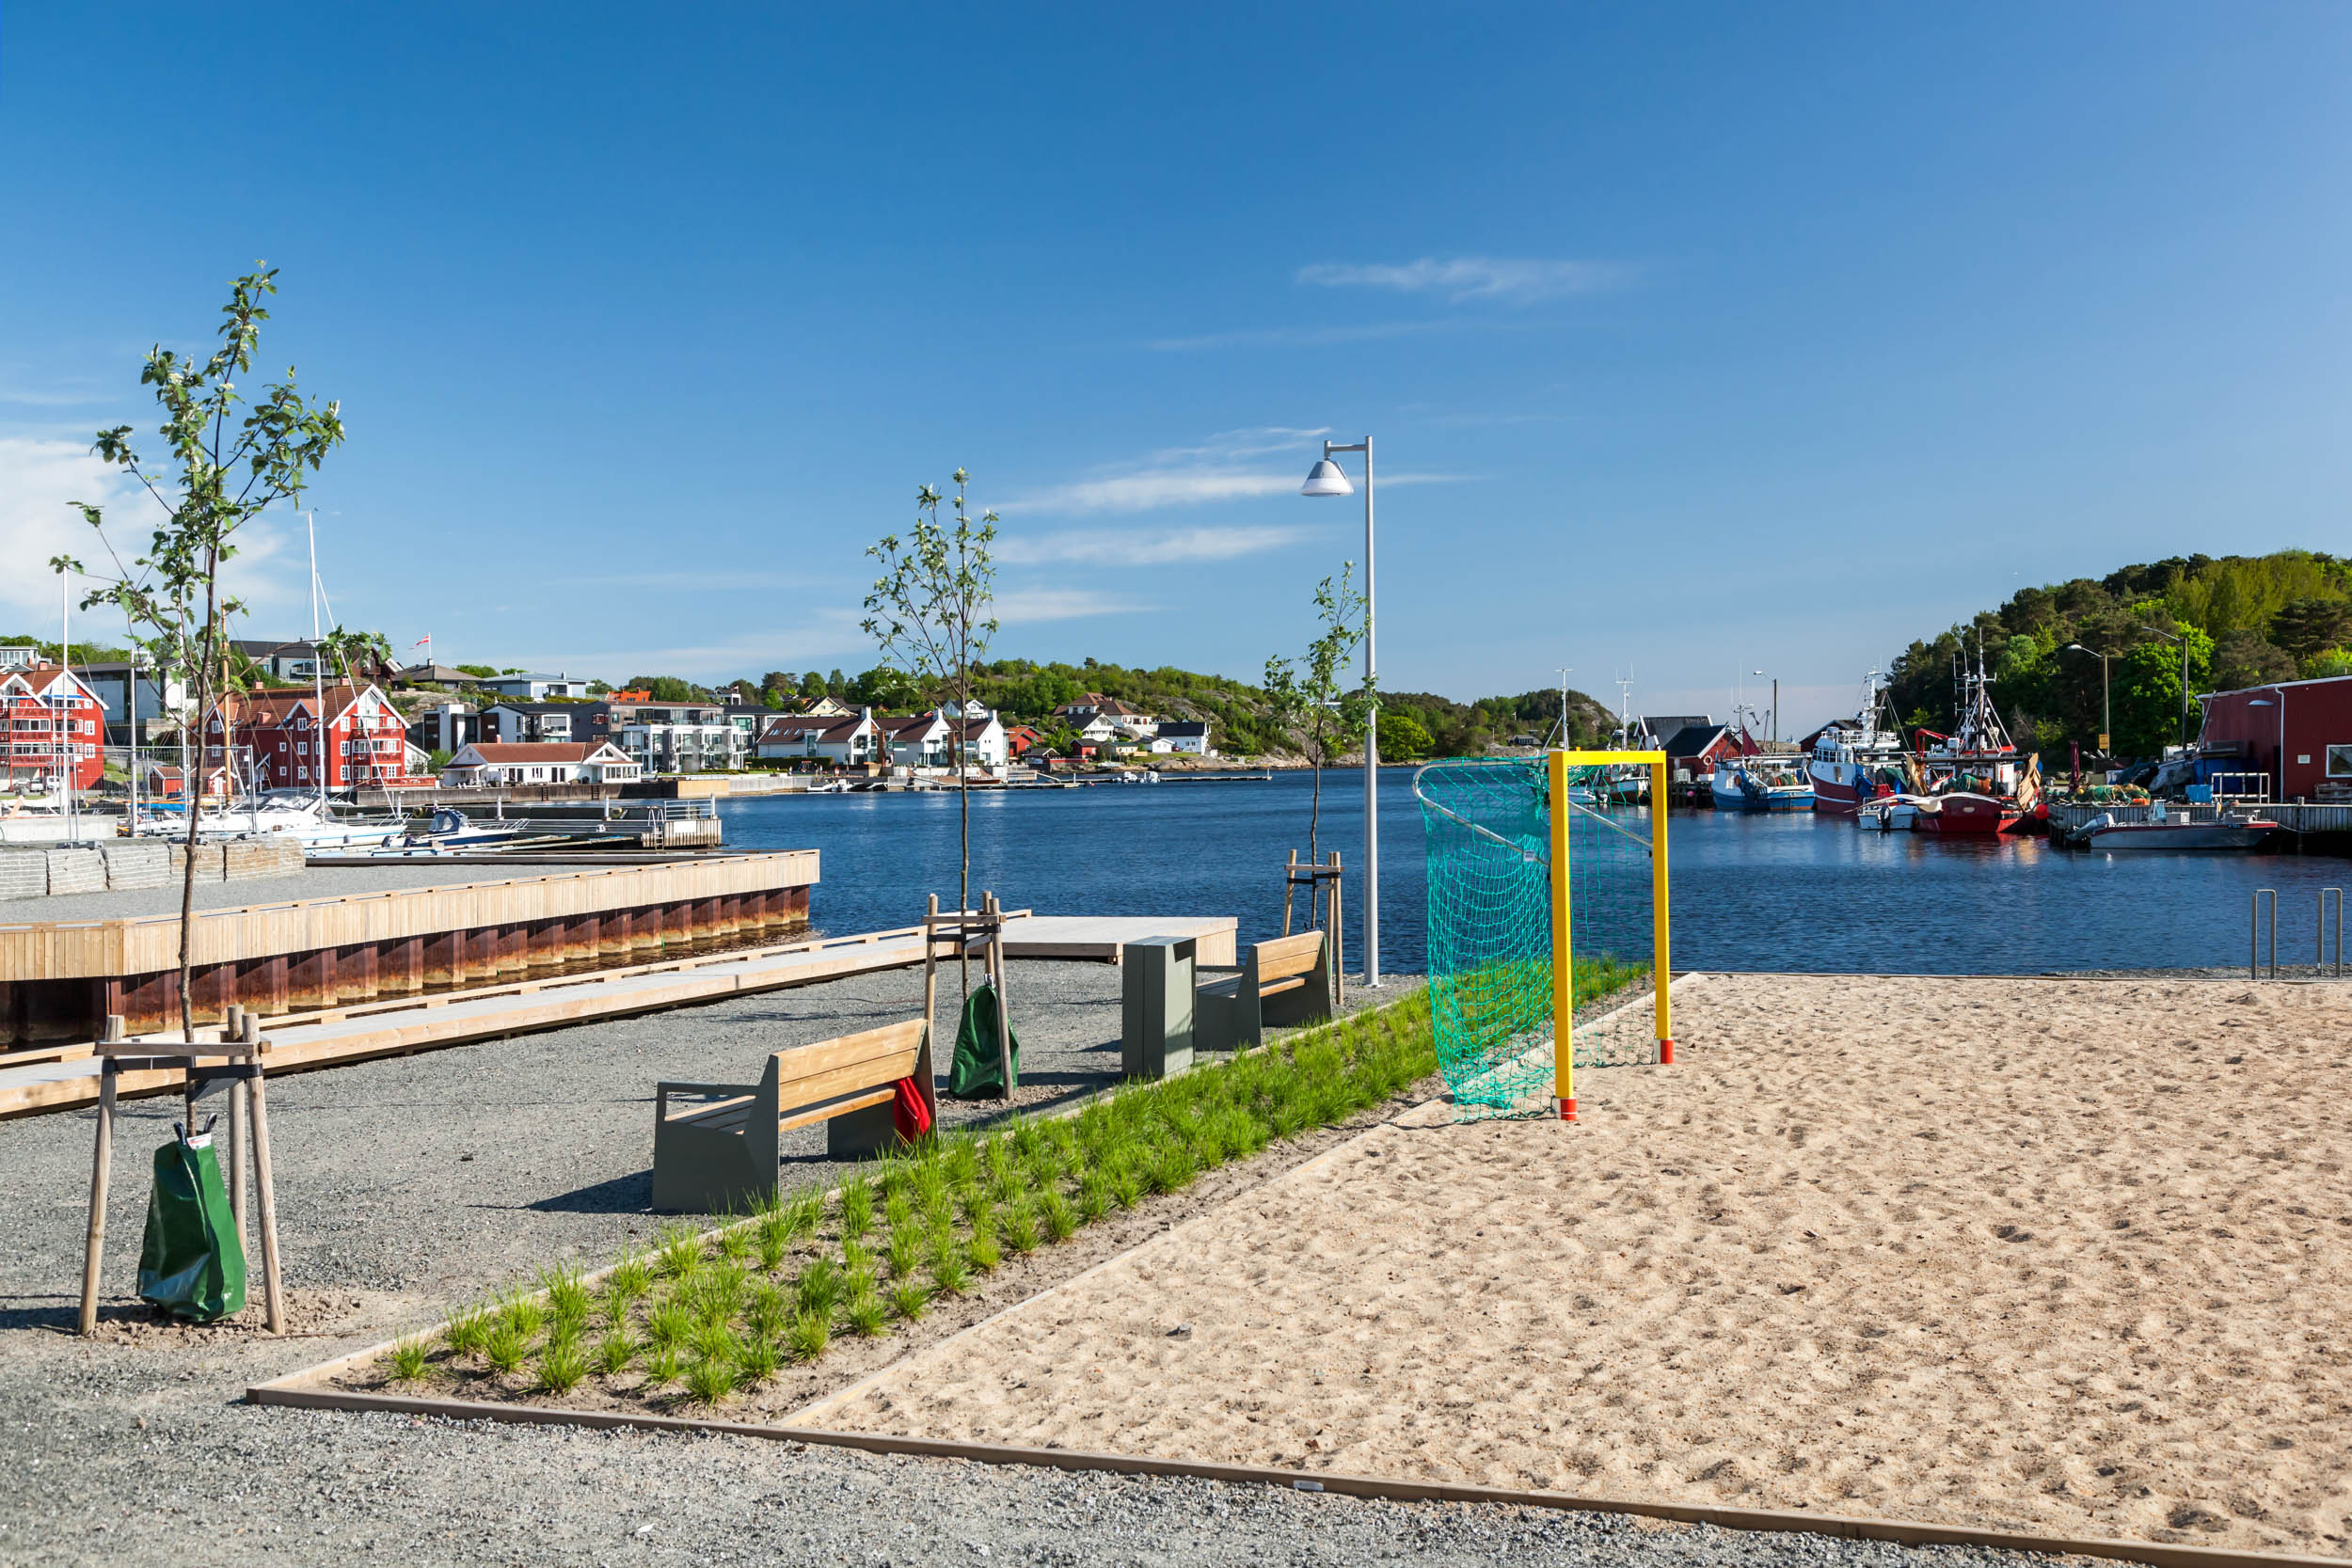 Strandparken